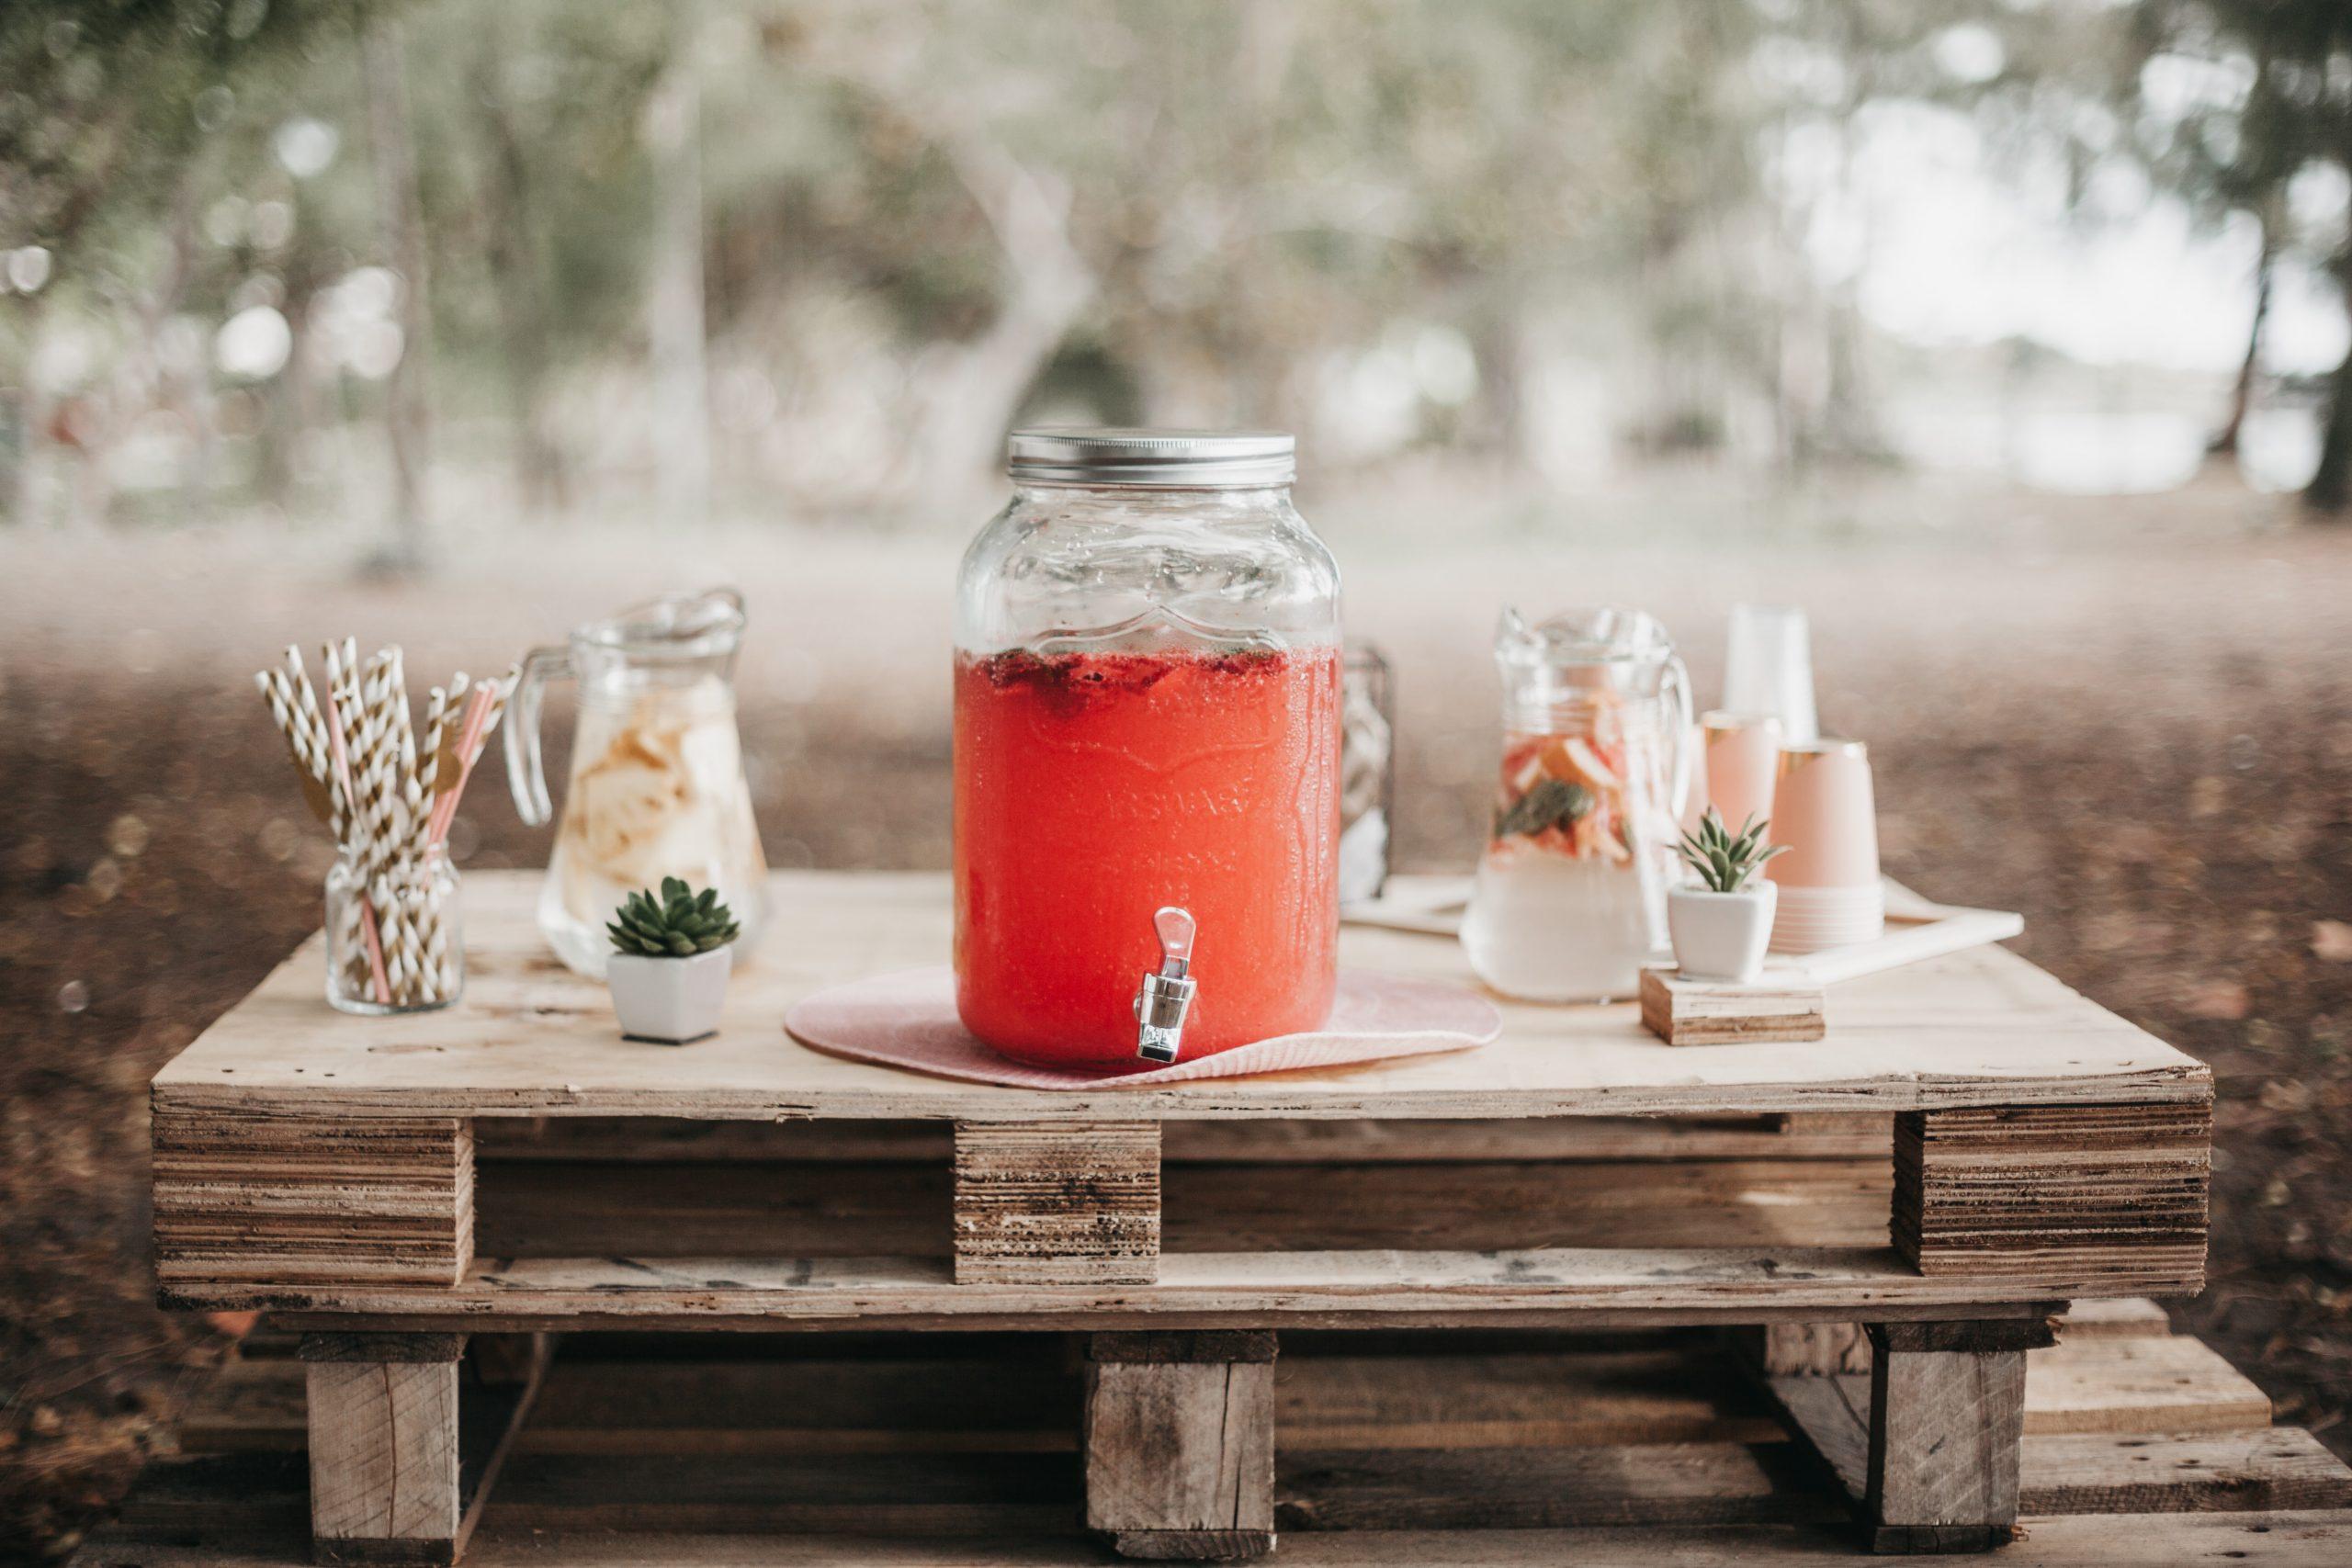 Pimms wedding cocktail Drunken Berries